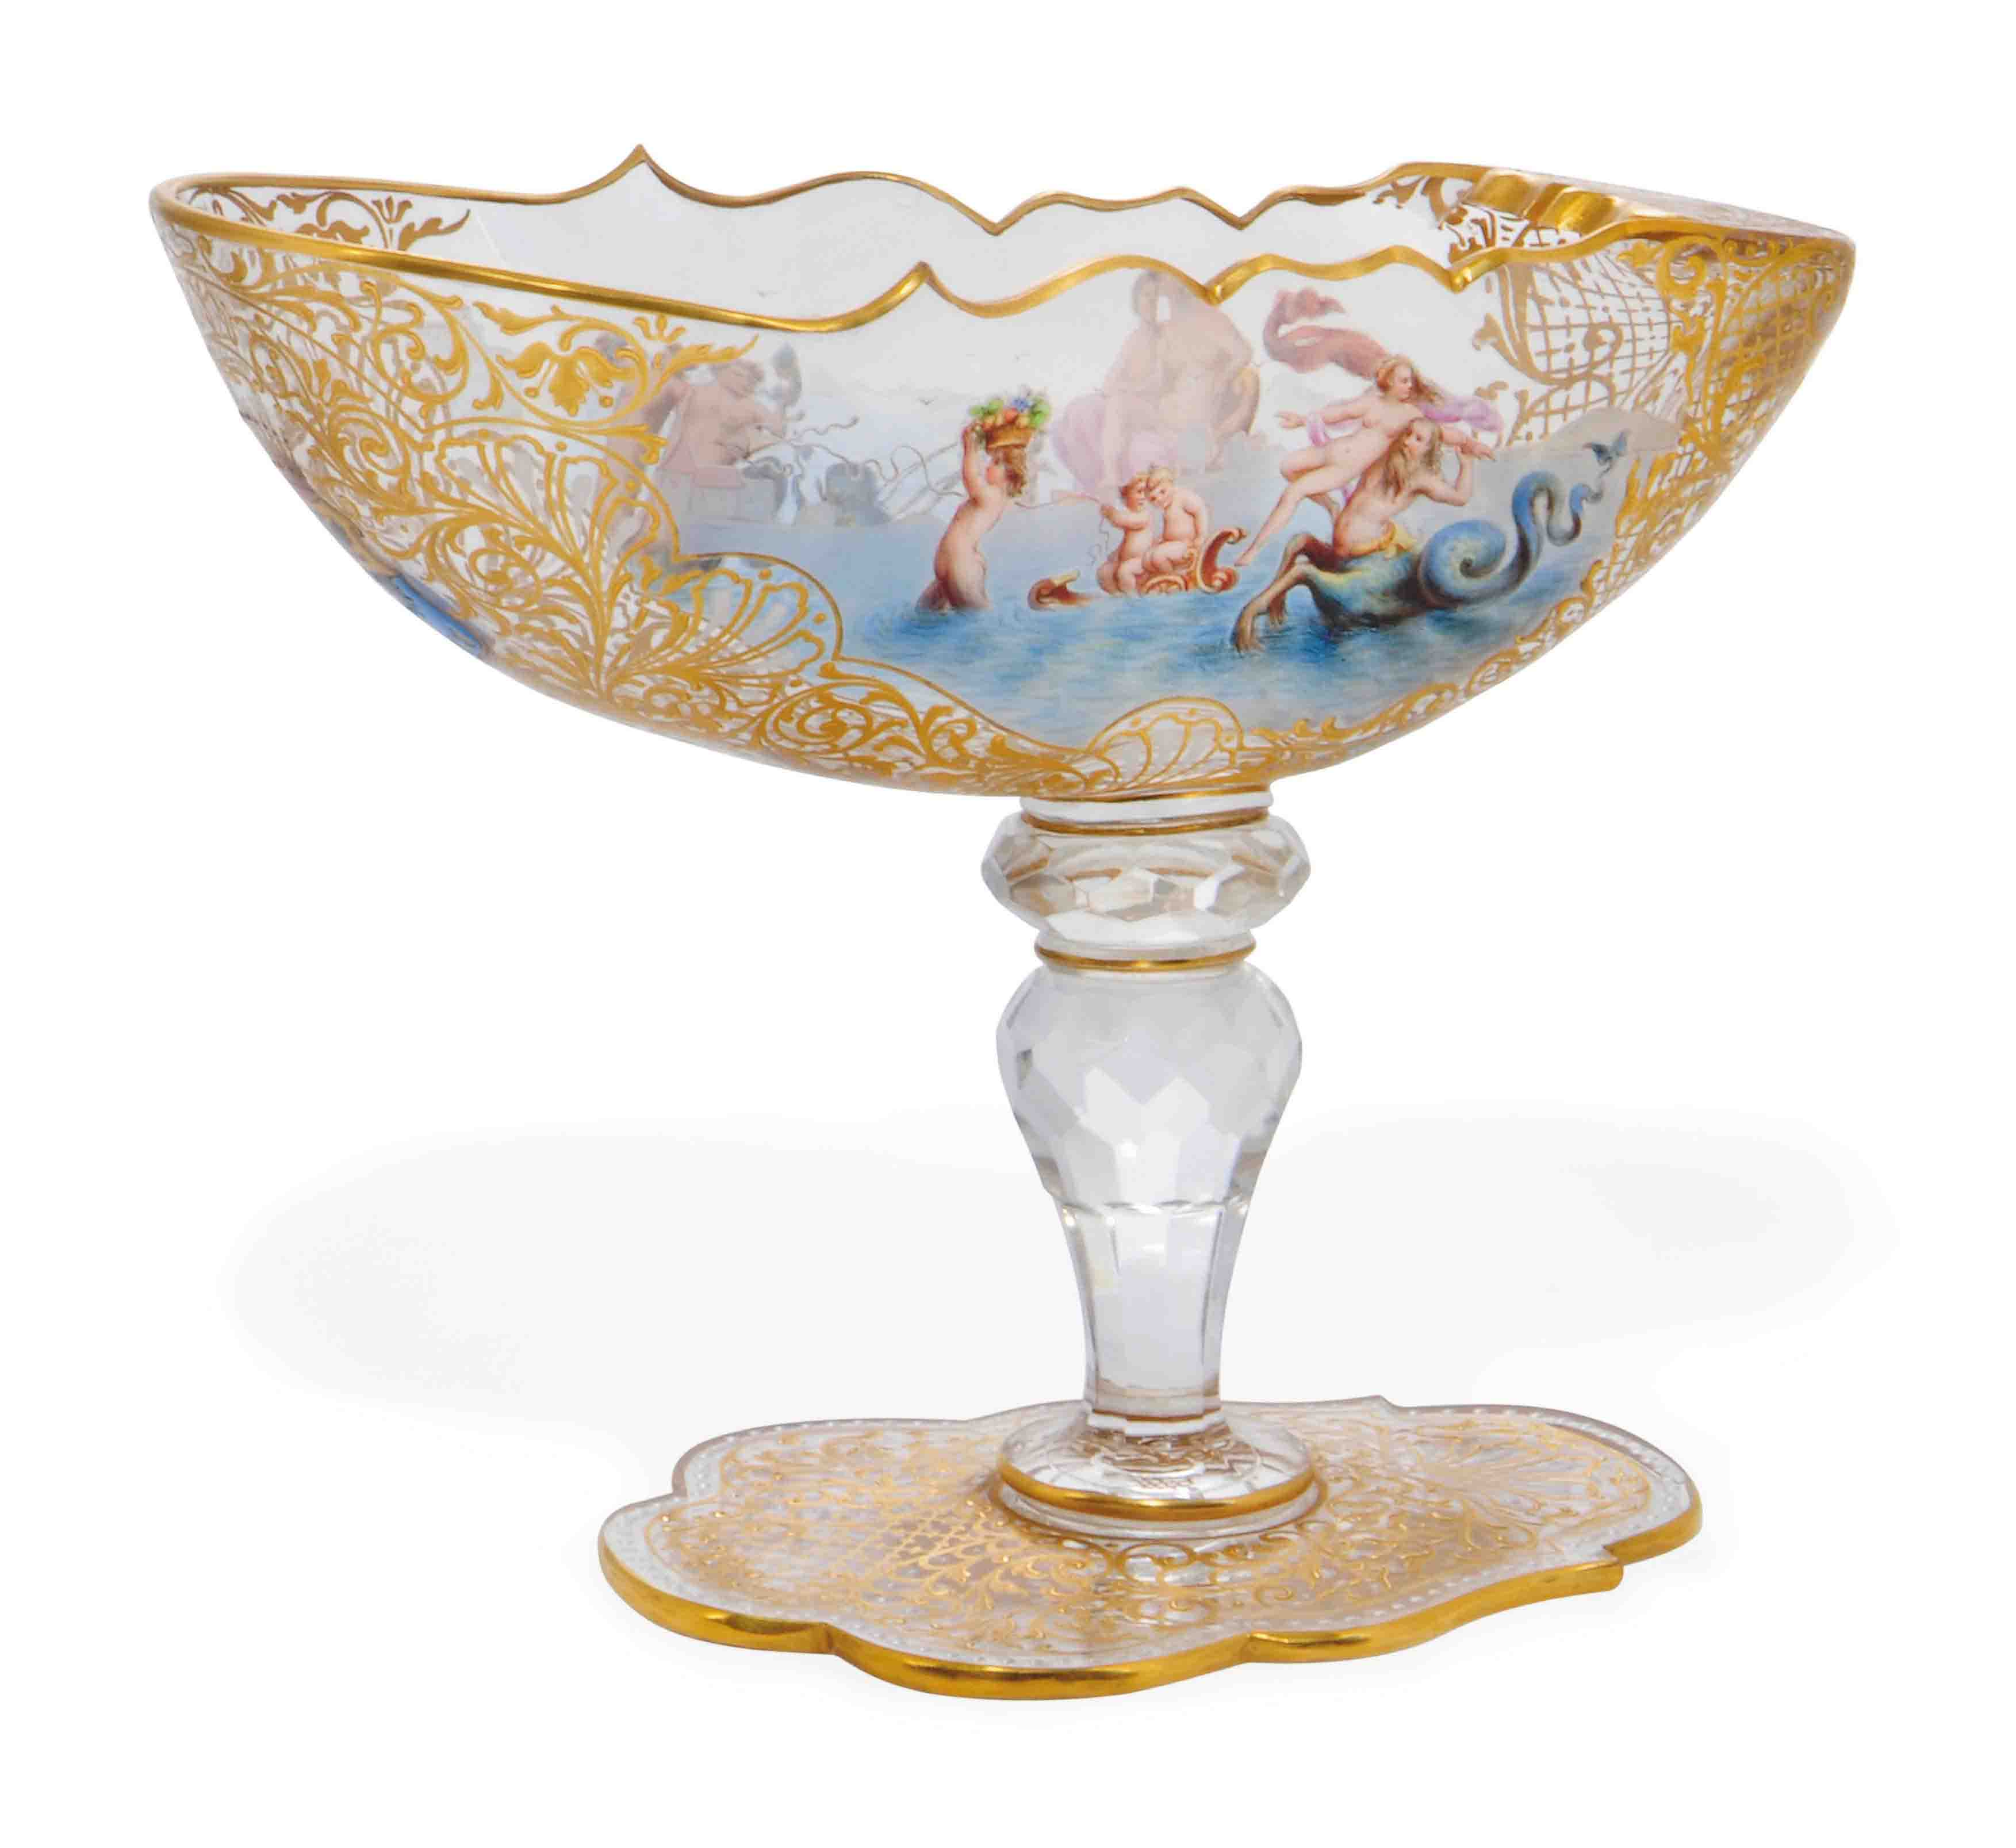 A LOBMEYR ENAMELLED GLASS ARMORIAL SWEETMEAT-DISH